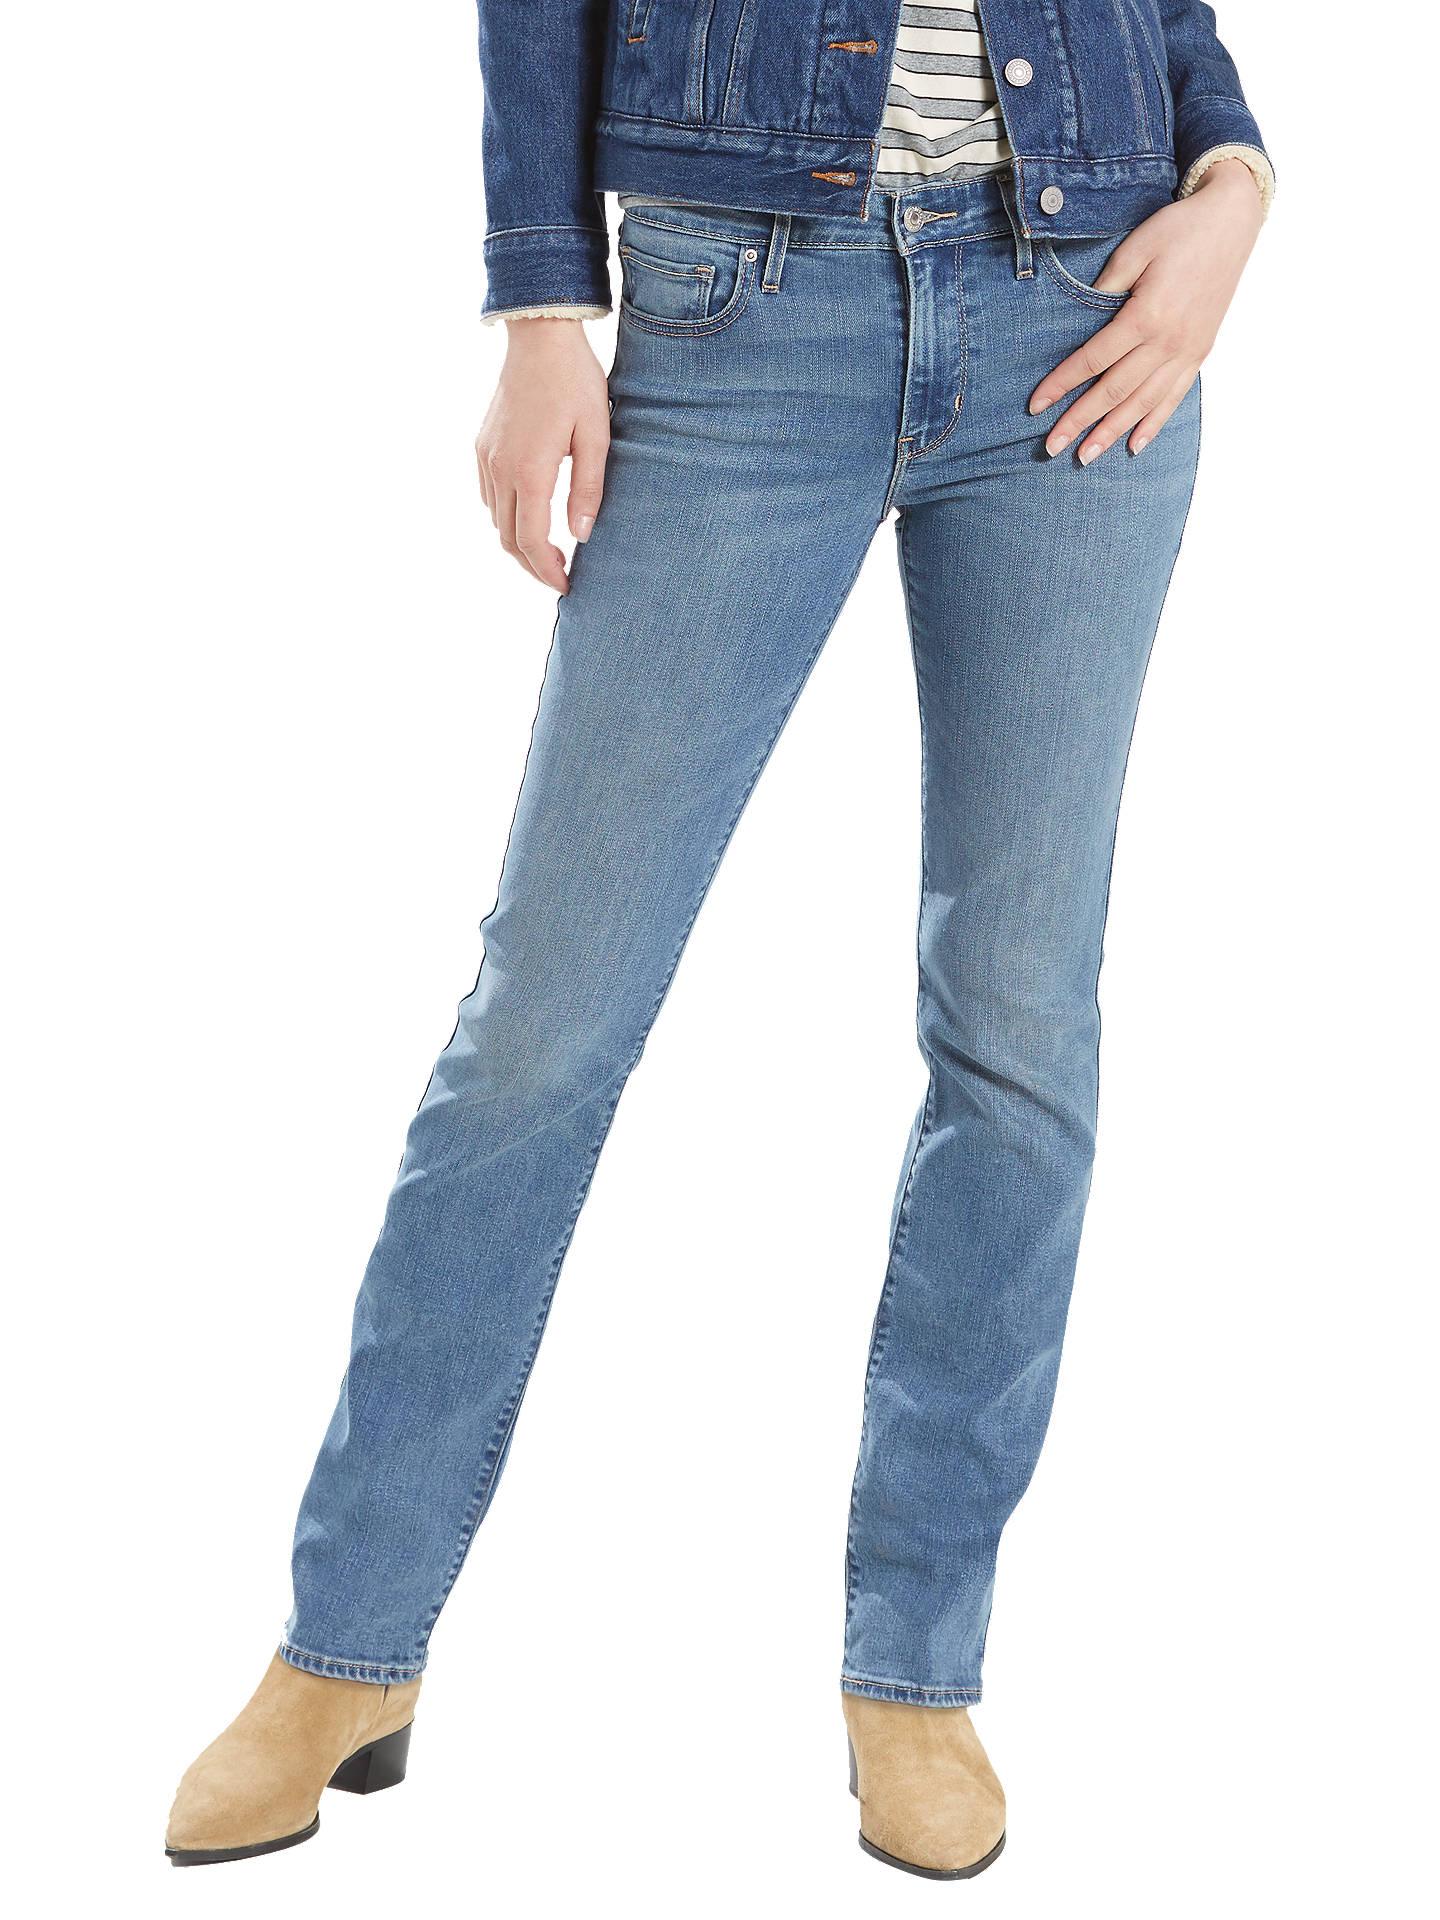 Levis 712 Mid Rise Slim Jeans South Side At John Lewis Partners Vintage Skin Rip Off Stretch Soft Buylevis W27 L30 Online Johnlewis